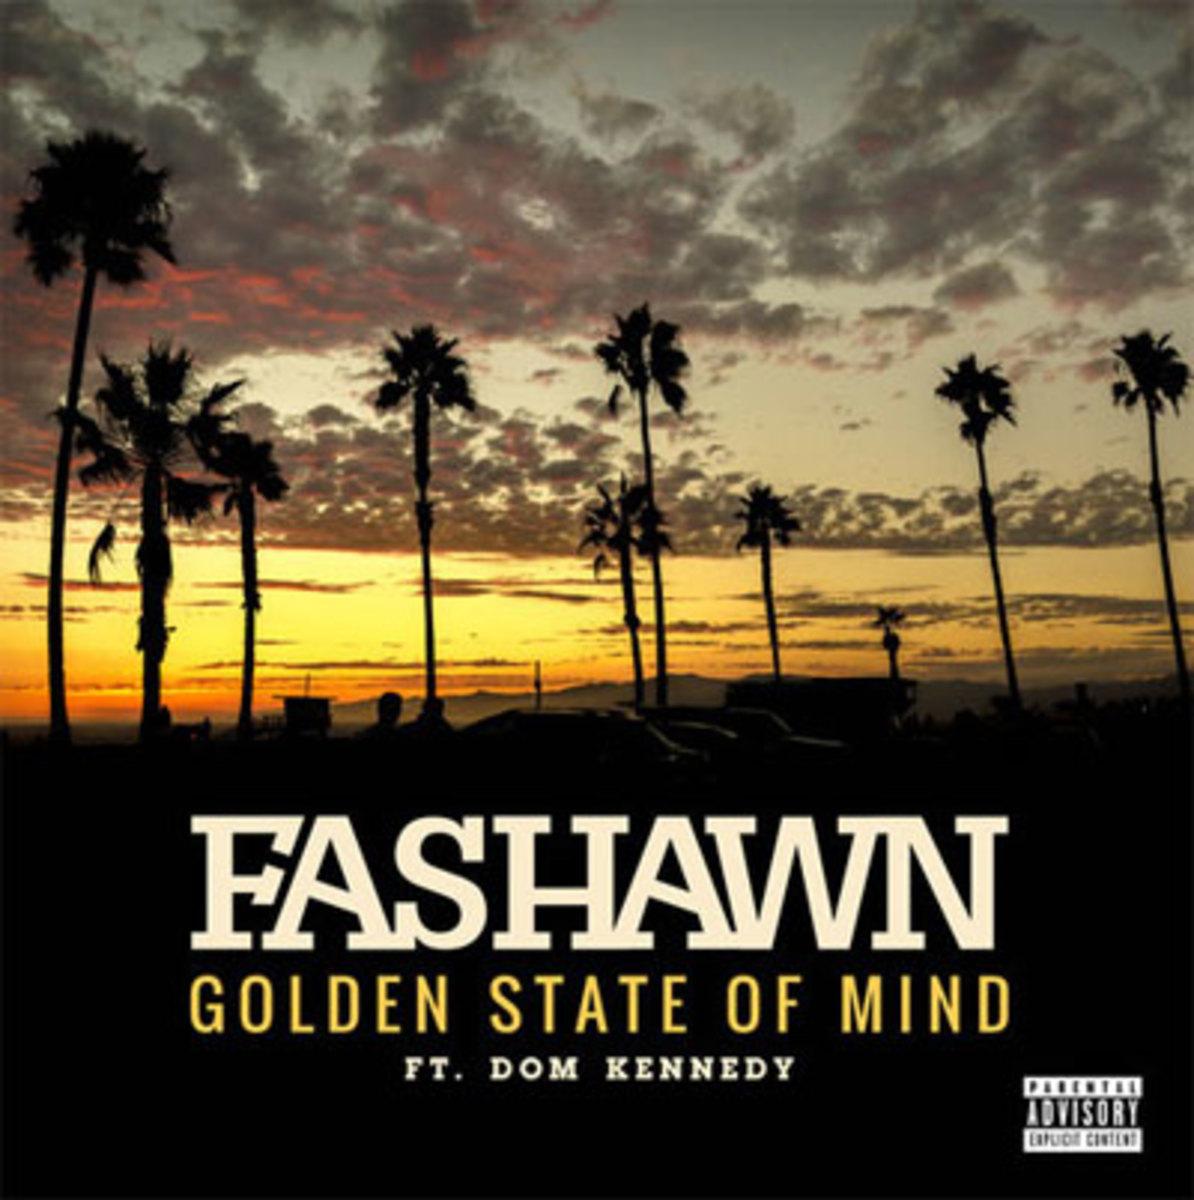 fashawn-goldenstateofmind.jpg